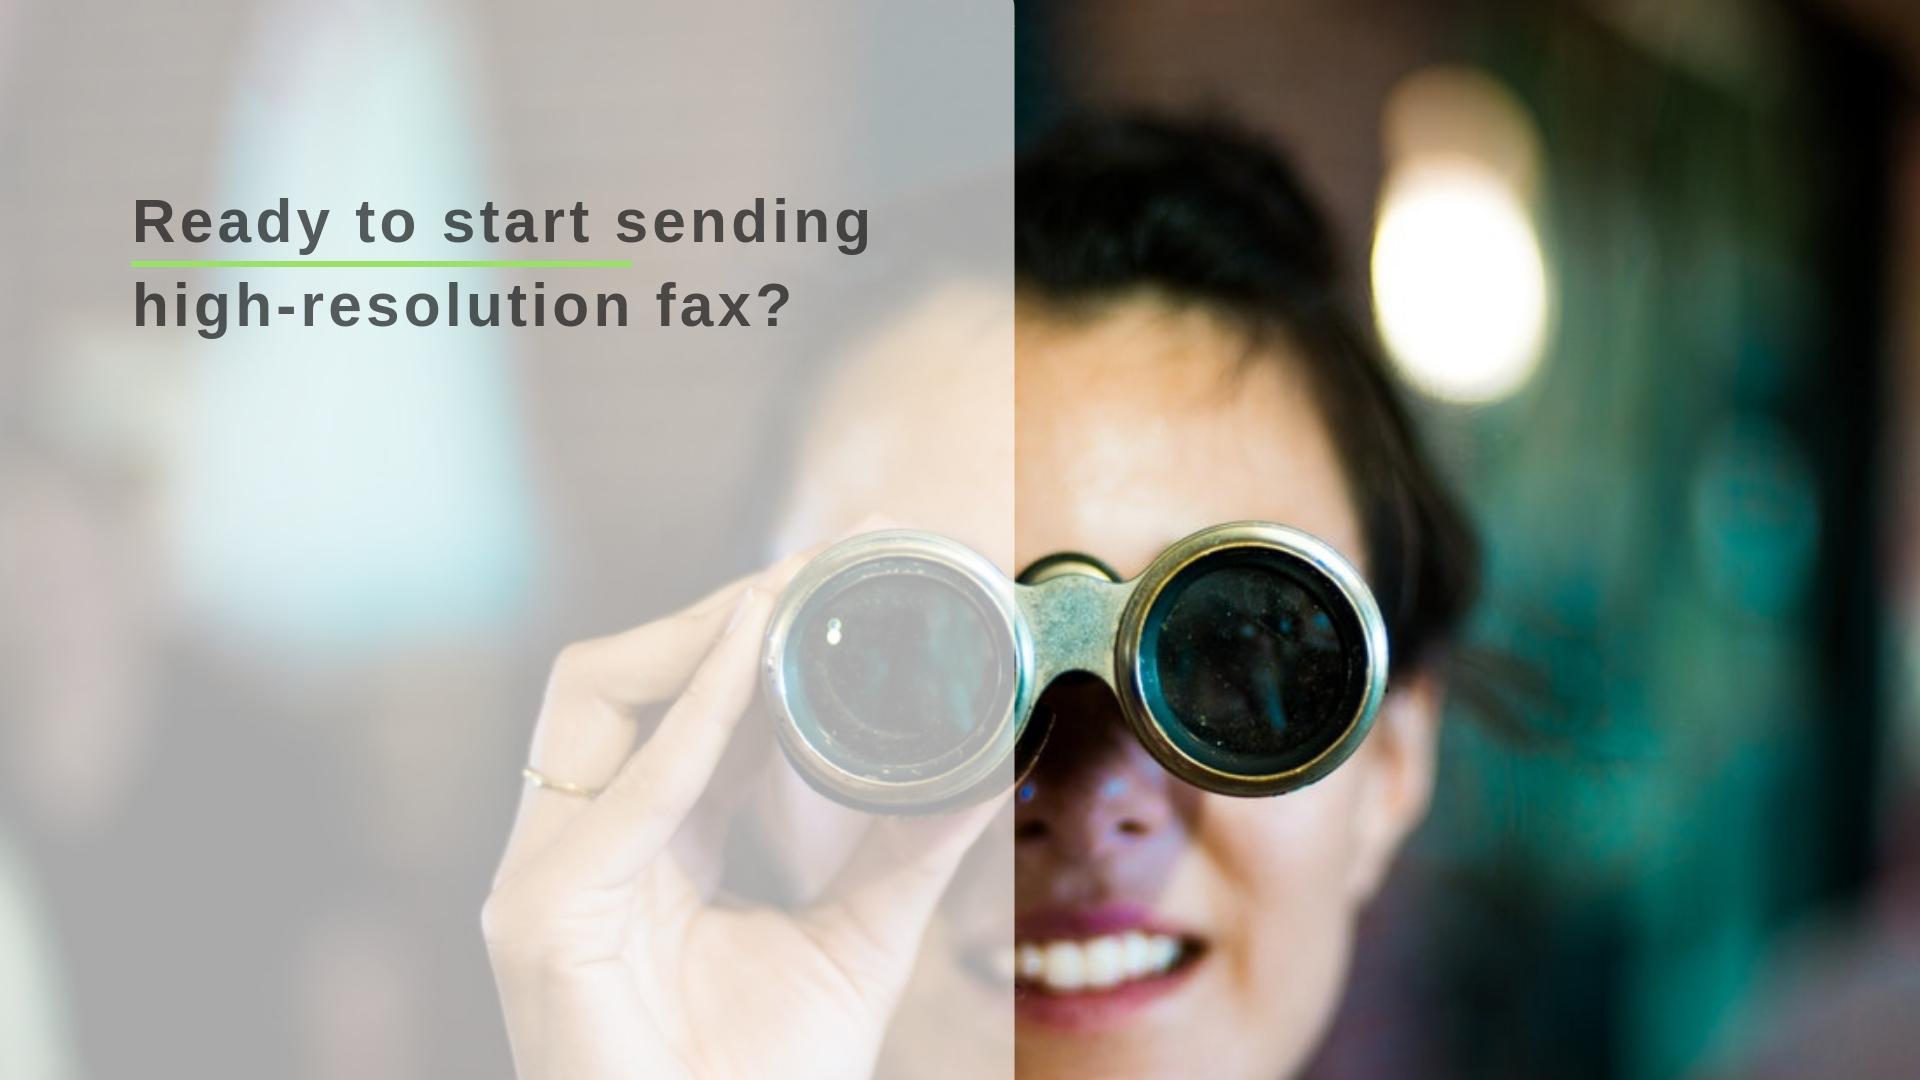 start-sending-high-resolution-fax-with-gofax